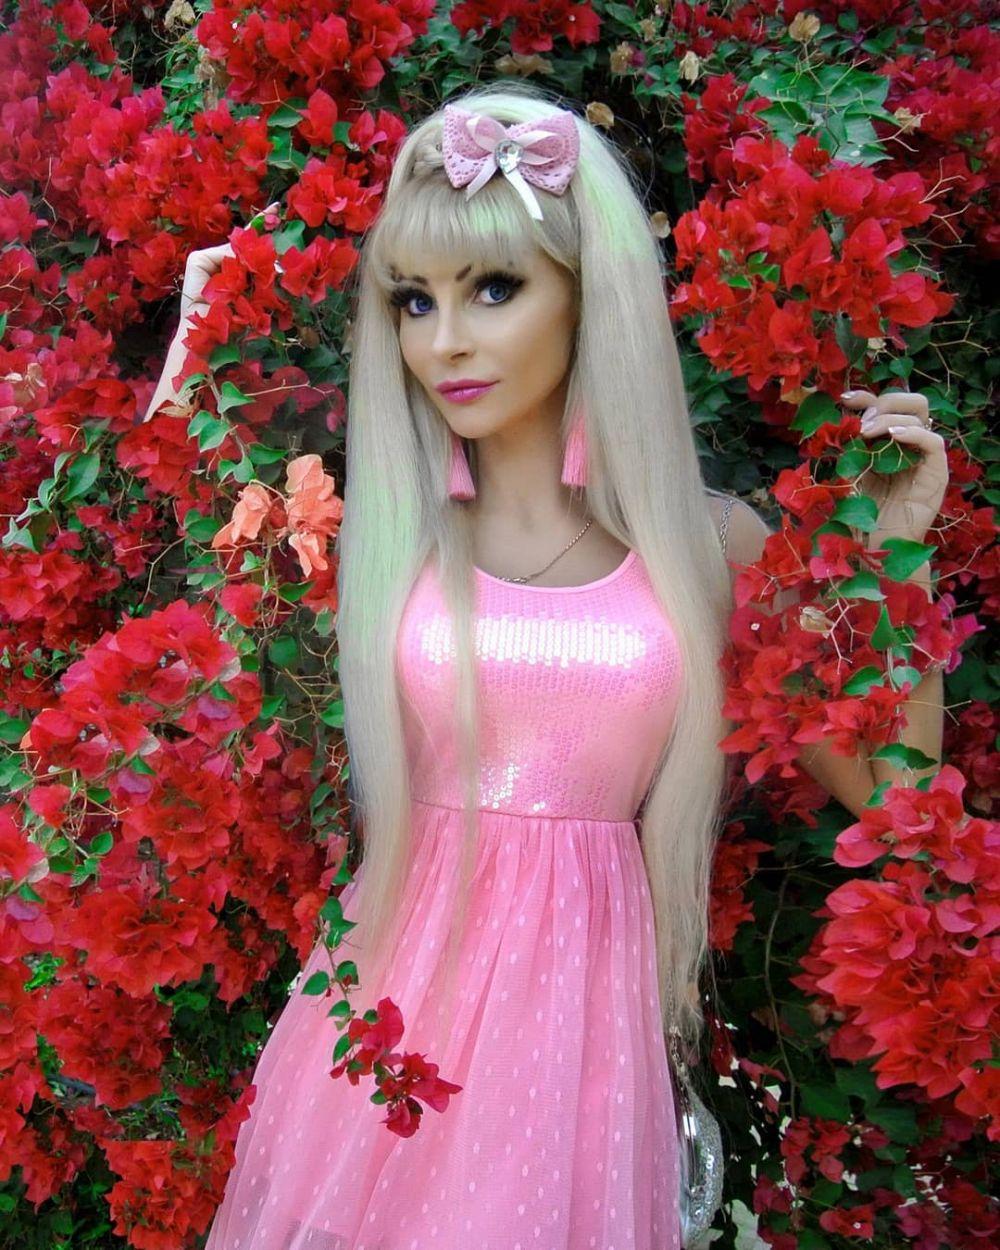 tatyana barbie © Instagram/@tanya_tuzova_barbie